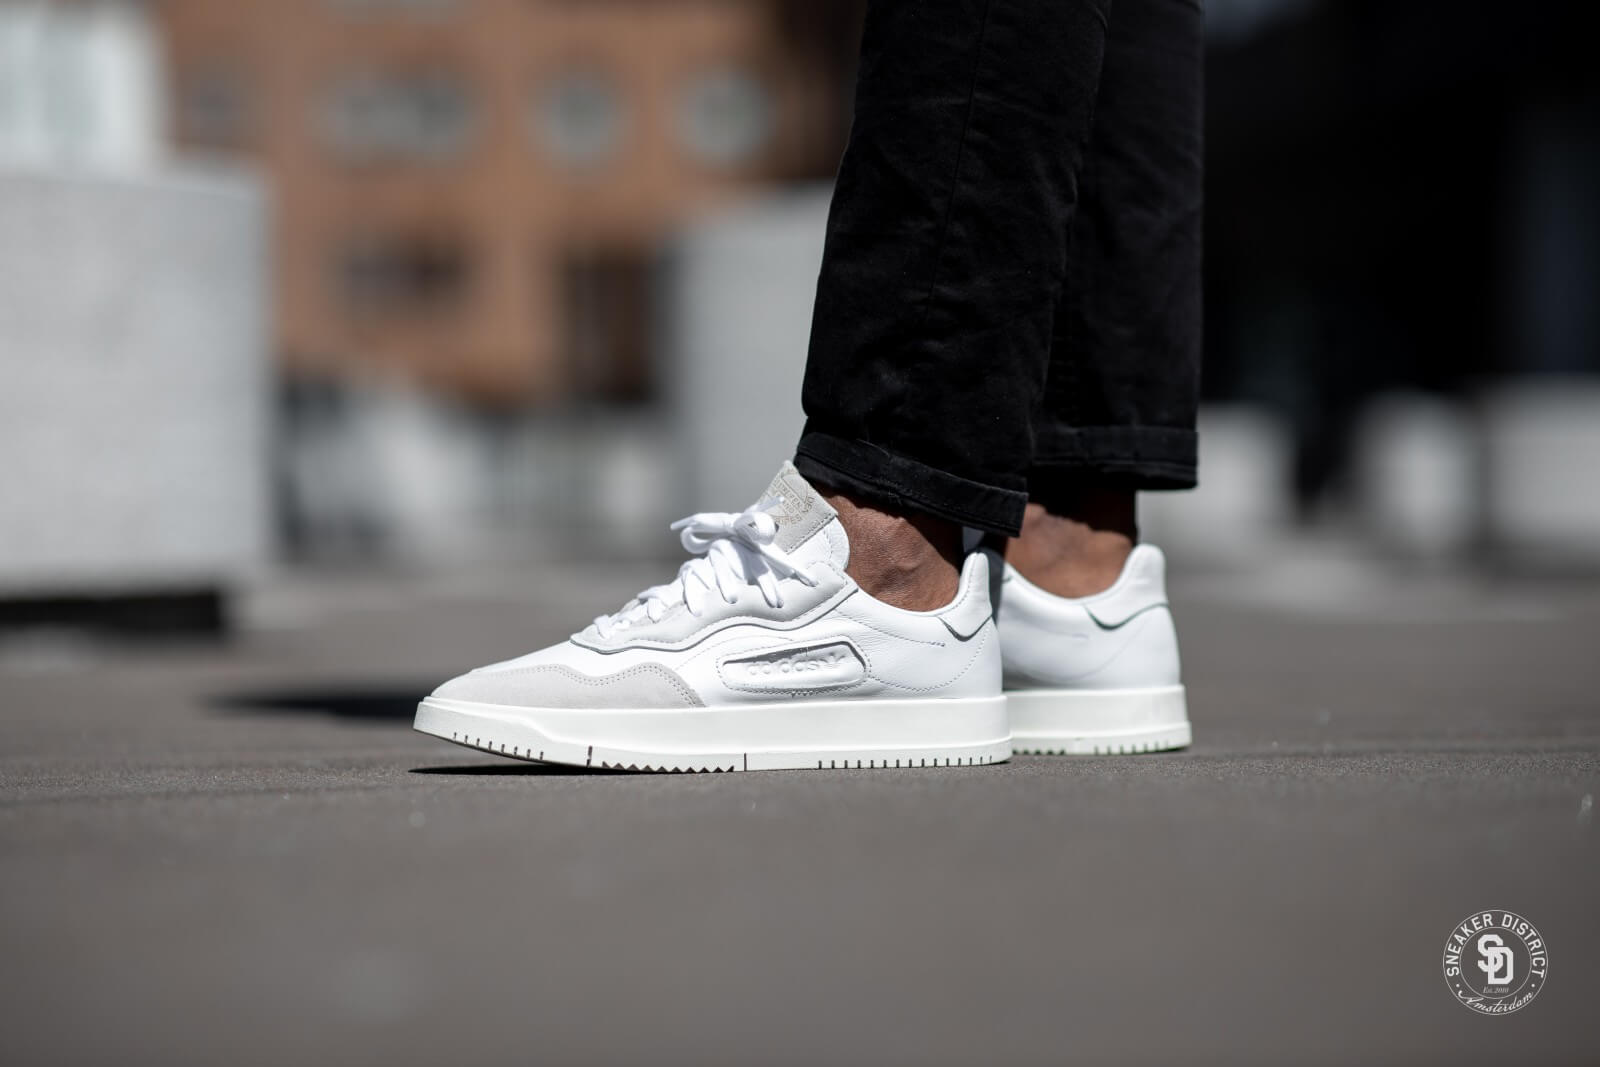 Adidas SC Premiere Crystal White/Chalk